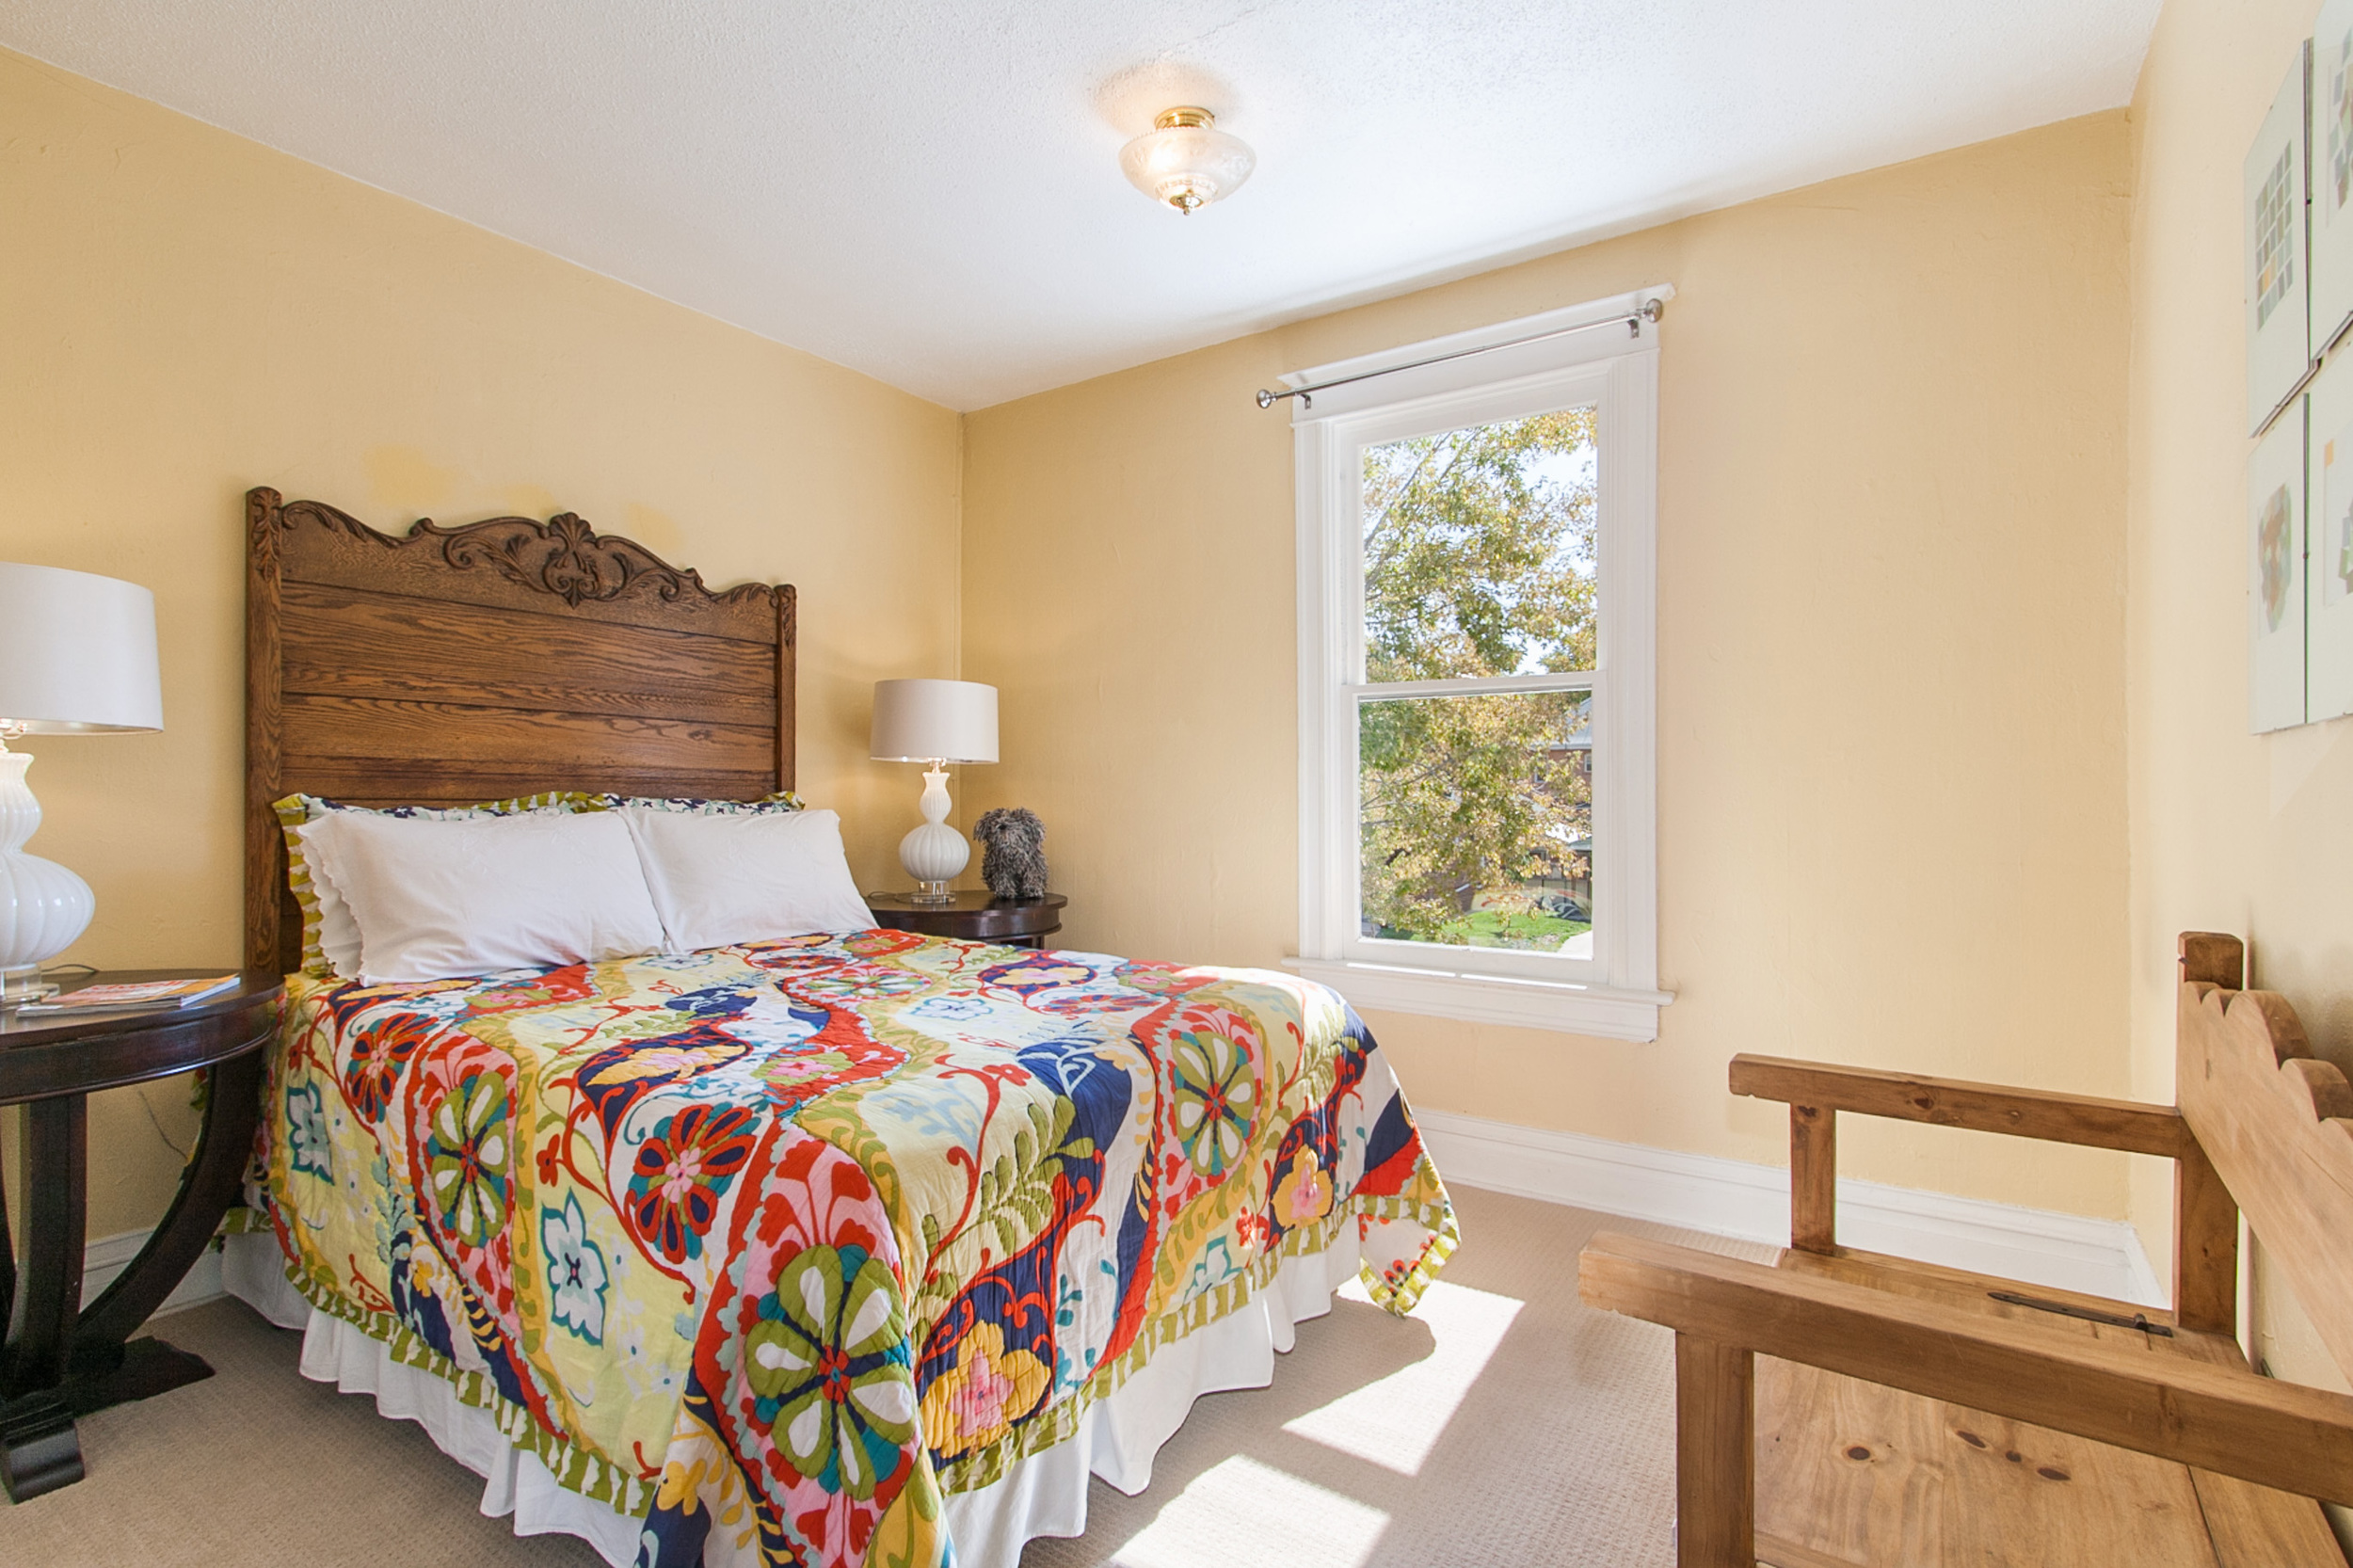 1100721_Sunny-Bedroom-Two_high.jpg